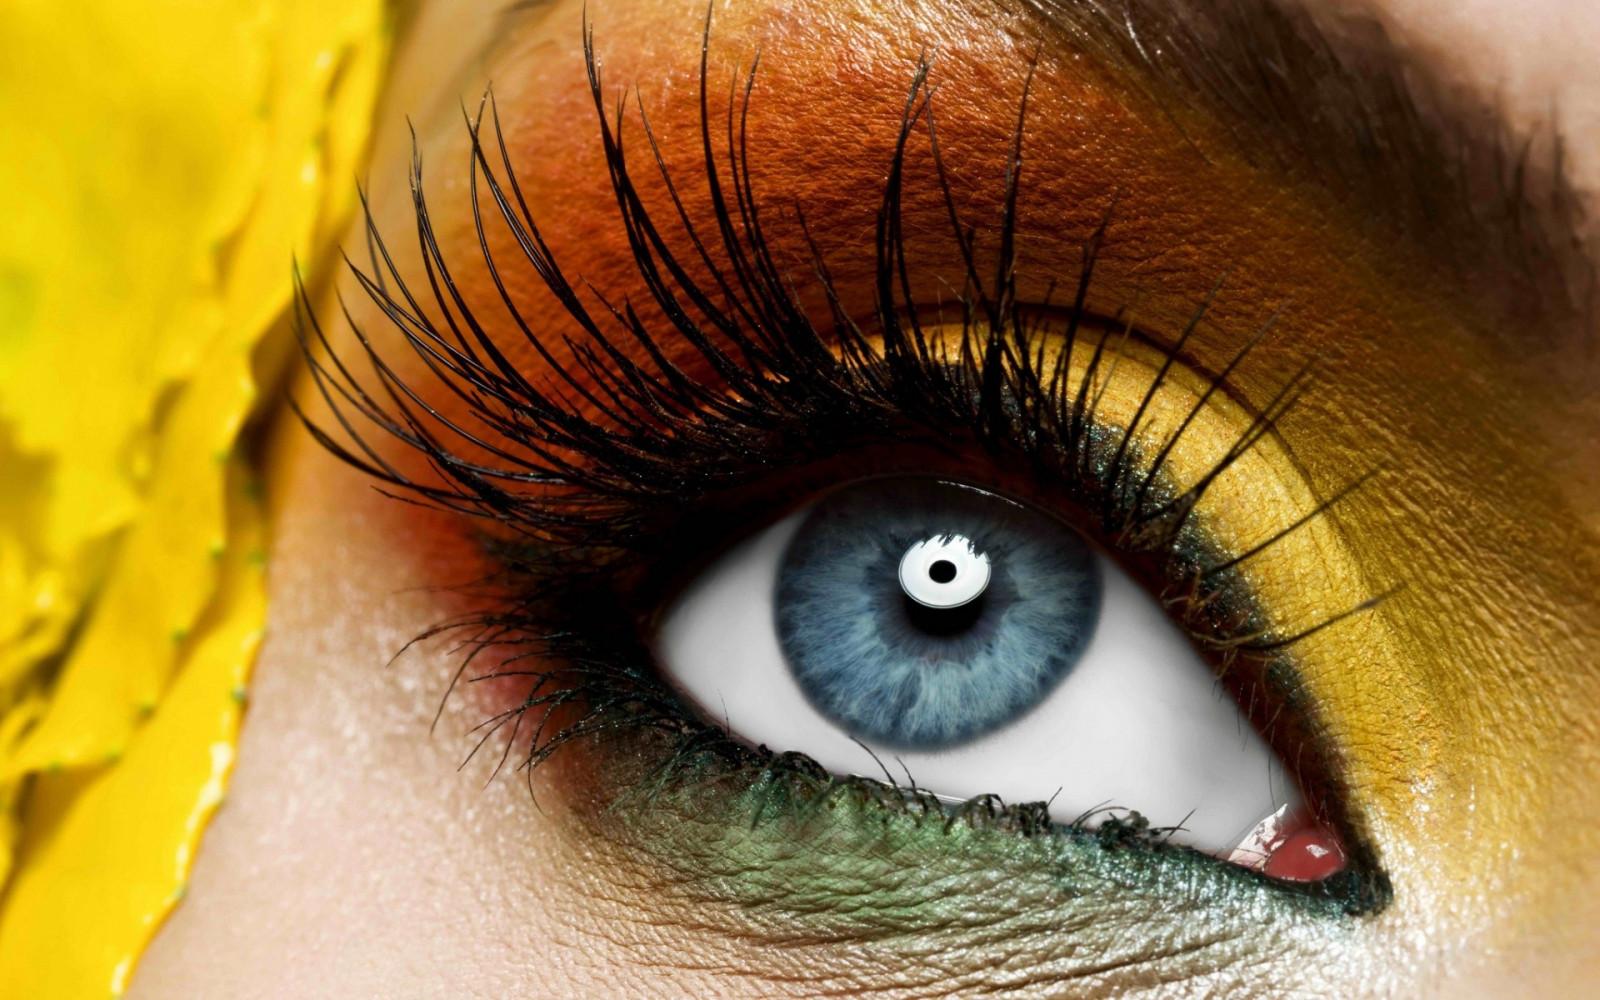 fond d 39 cran visage femmes les yeux rouge maquillage fermer vert jaune bleu nez t te. Black Bedroom Furniture Sets. Home Design Ideas